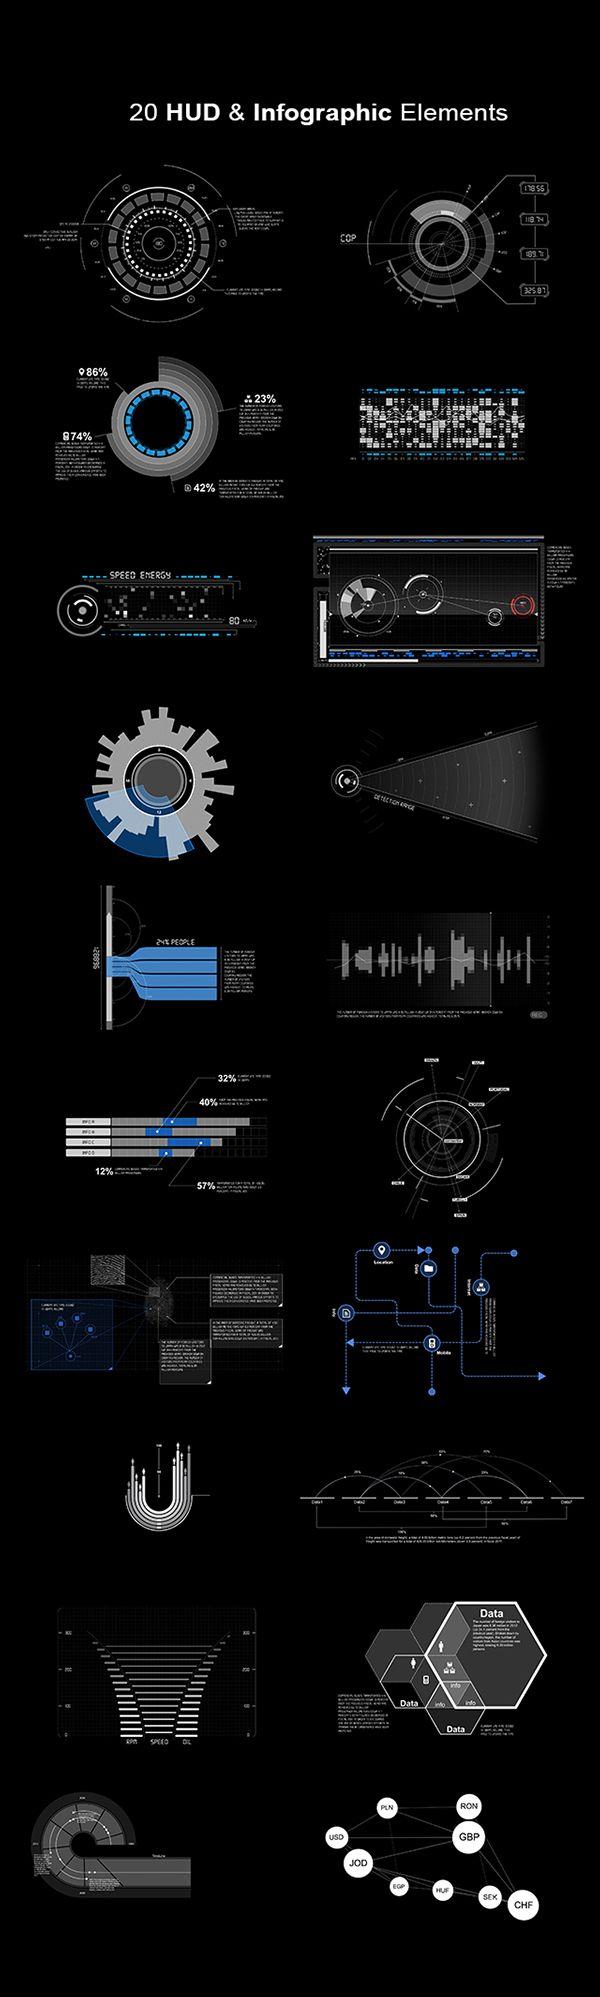 HUD & Infographic Elements by Jones Lee, via Behance